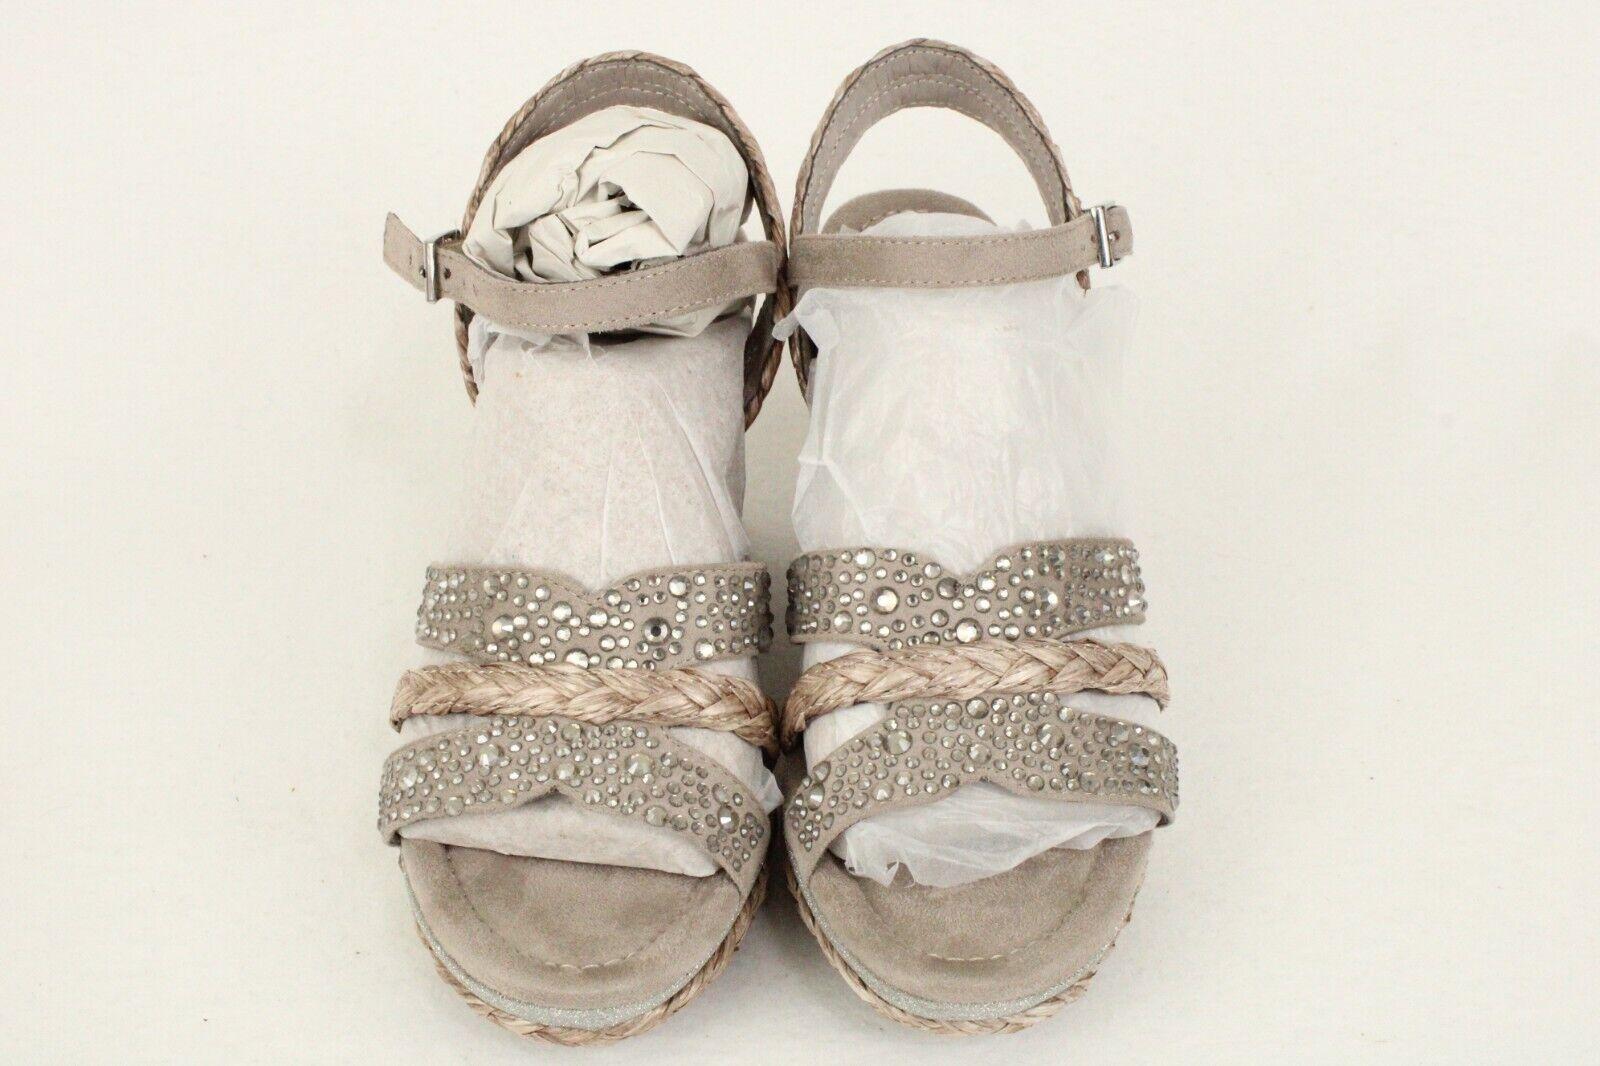 Impo Olympia Jute-Covered Wedge Heel Rhinestone Embellishments Shoes Sz 6.5 M US